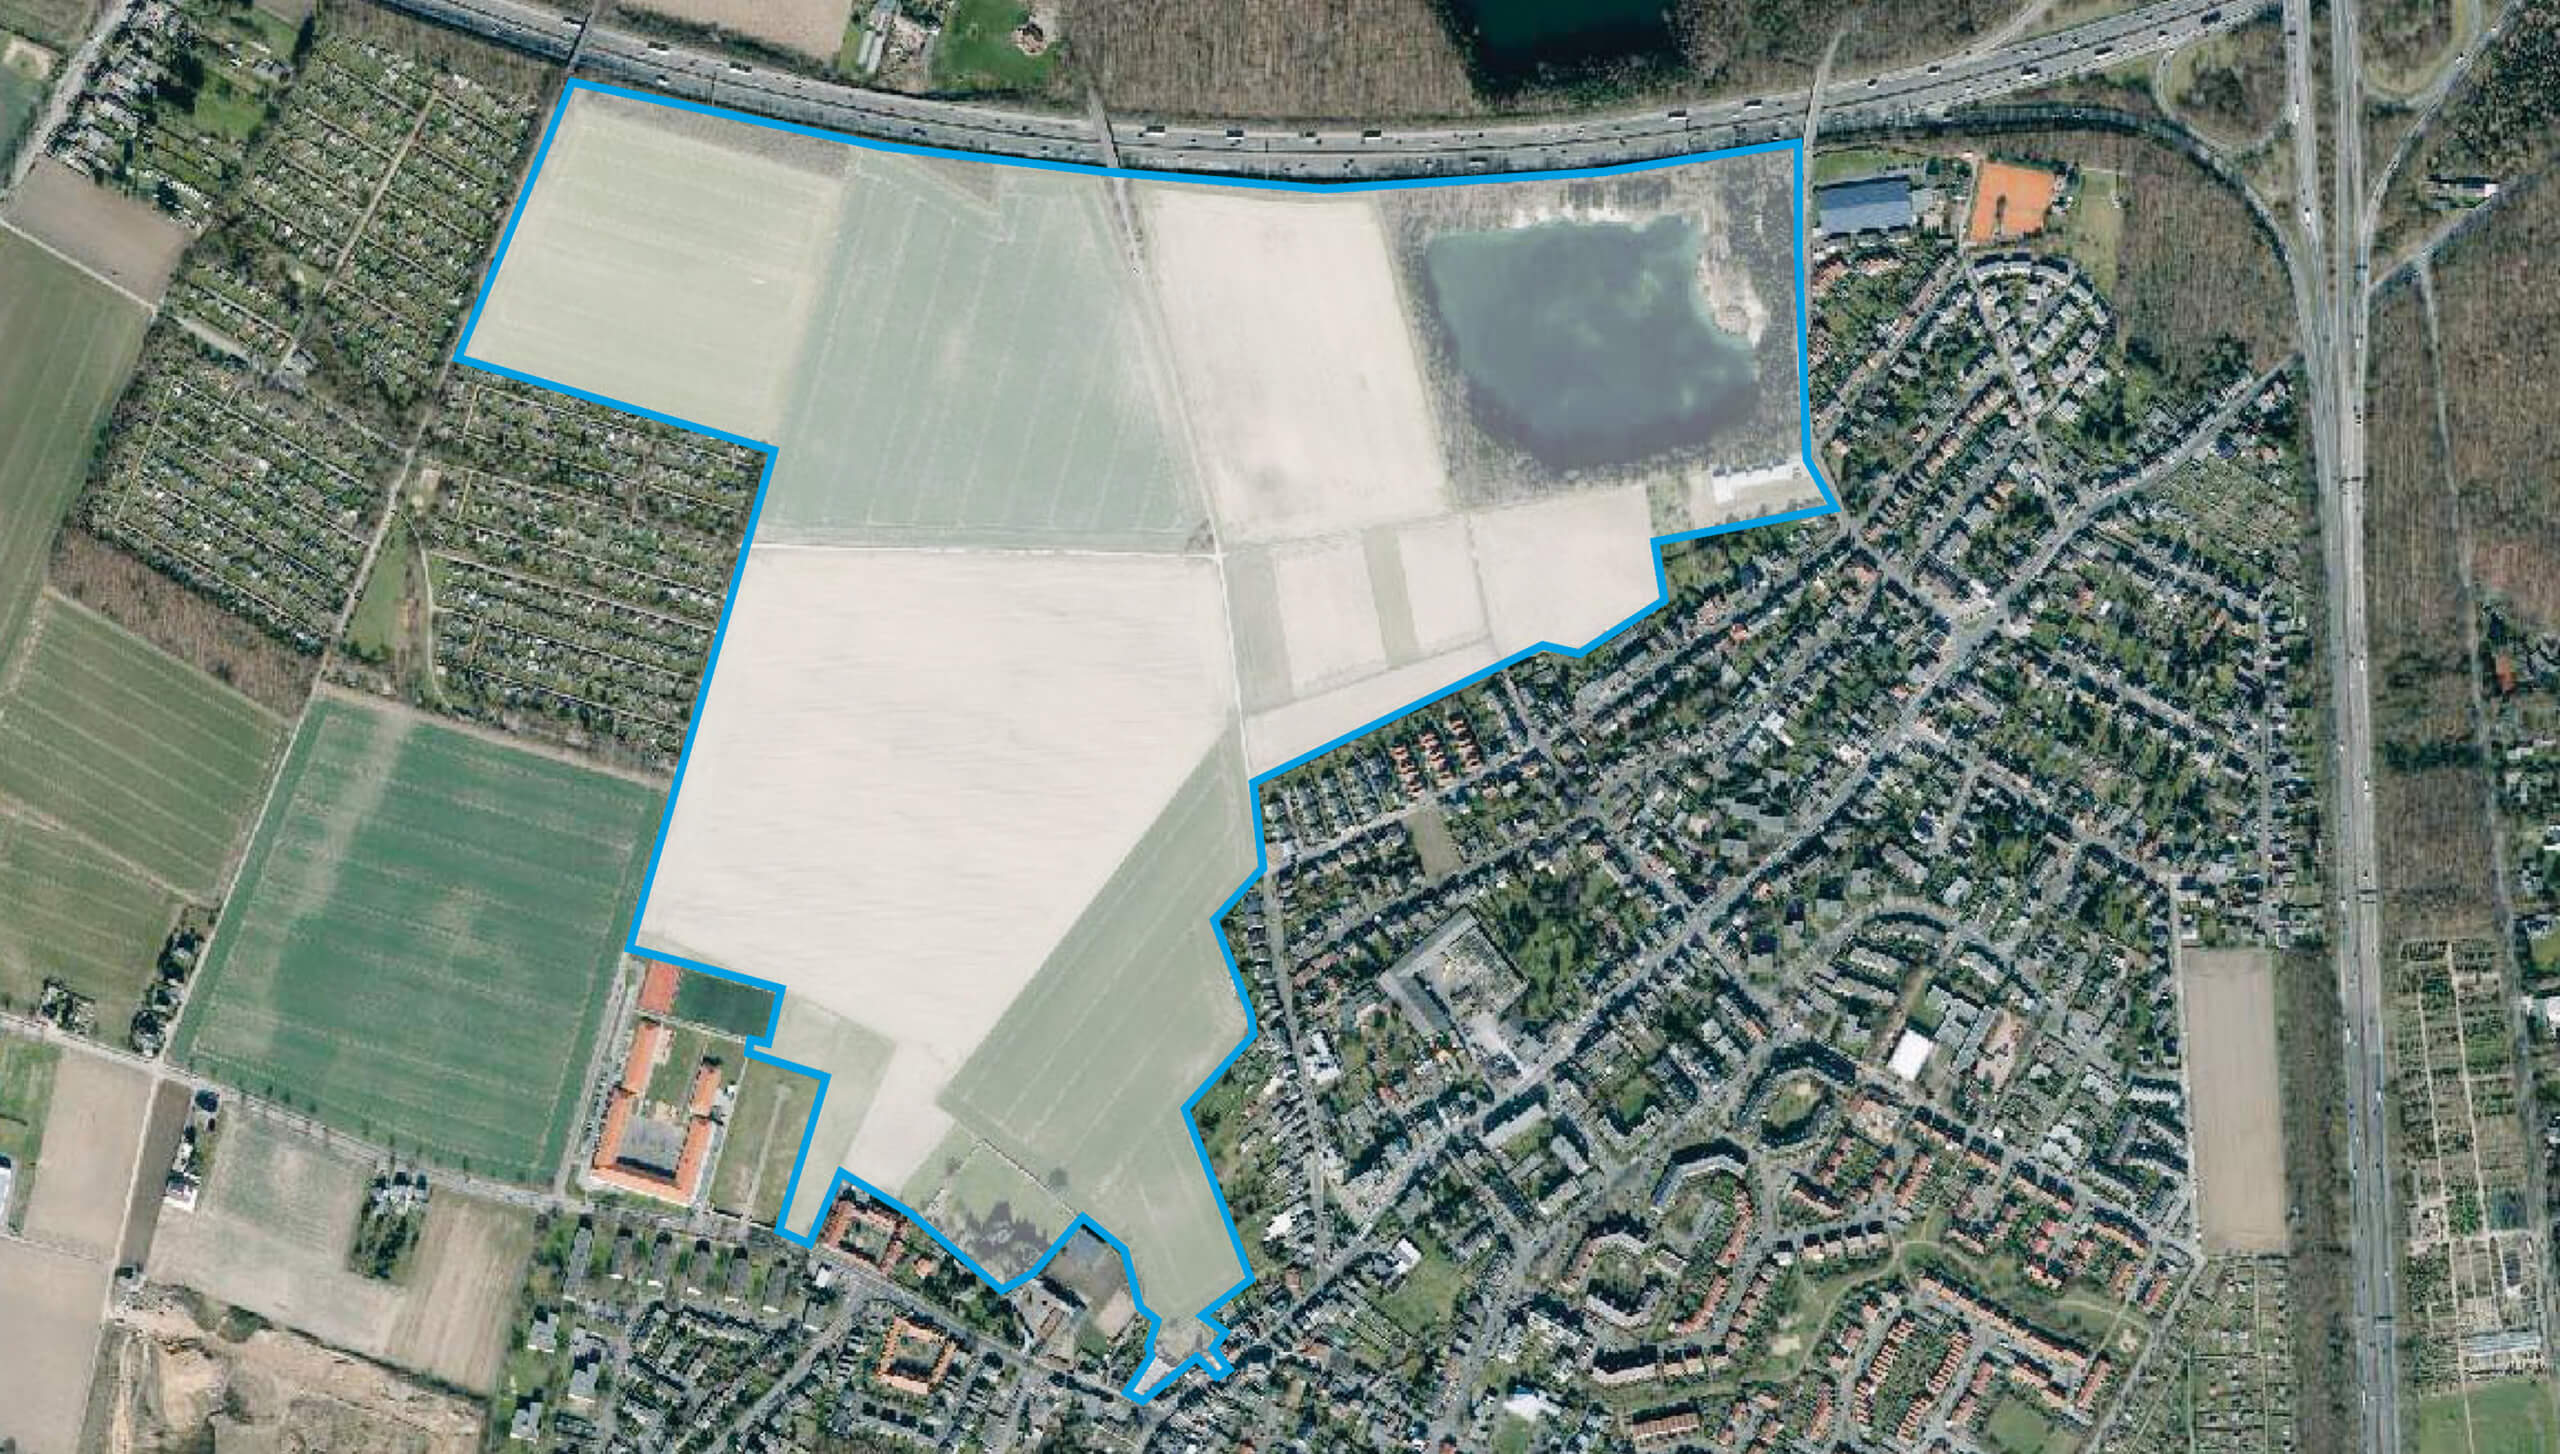 Beratung Dorfgemeinschaft Rondorf, Luftbild Planungsgebiet